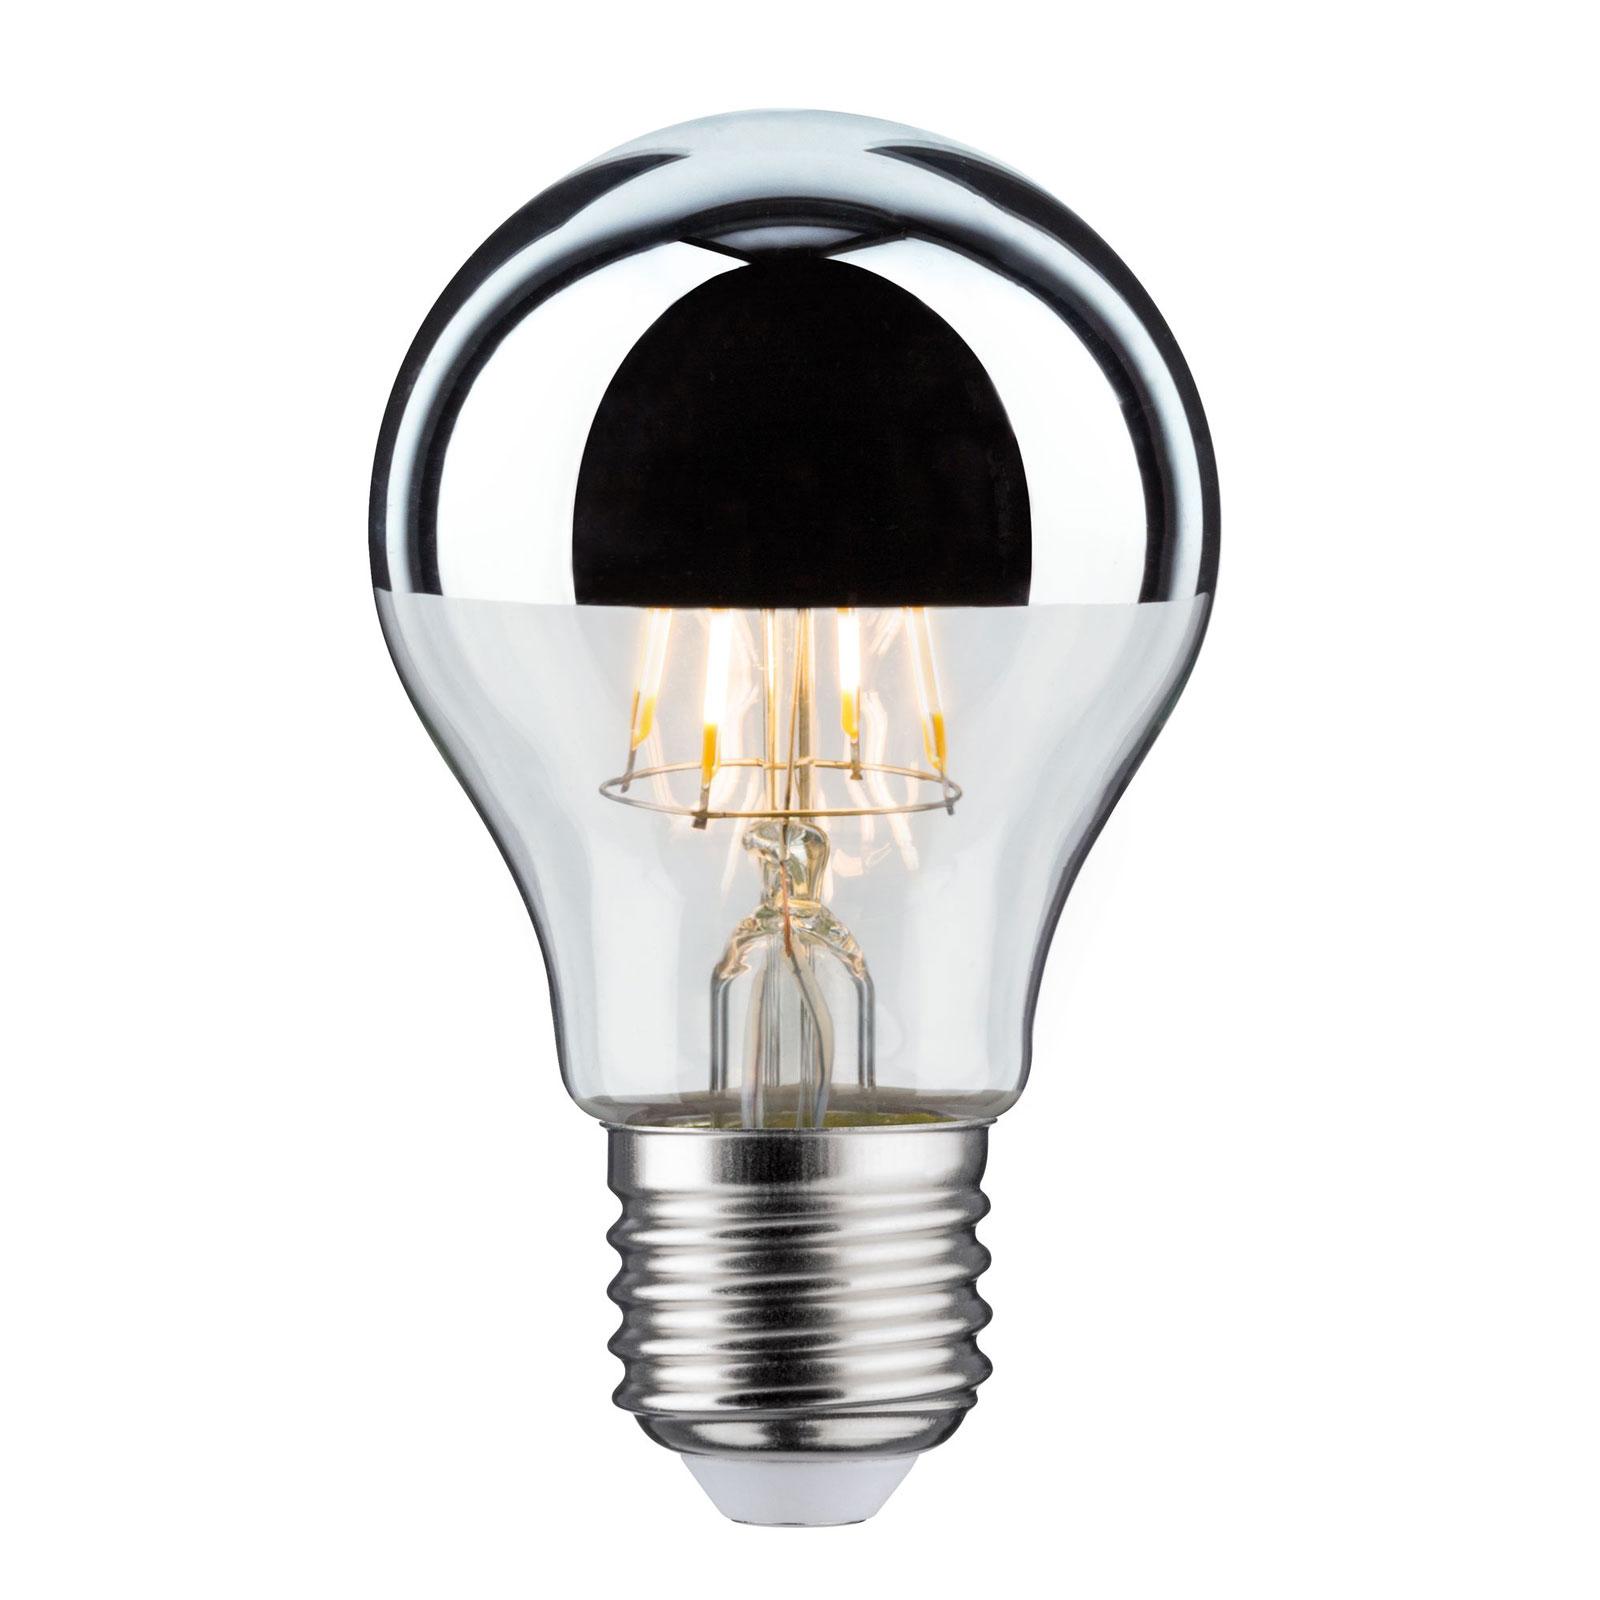 Lampadina LED E27 goccia 827 dicroica 4,8W Illuminazione per interni